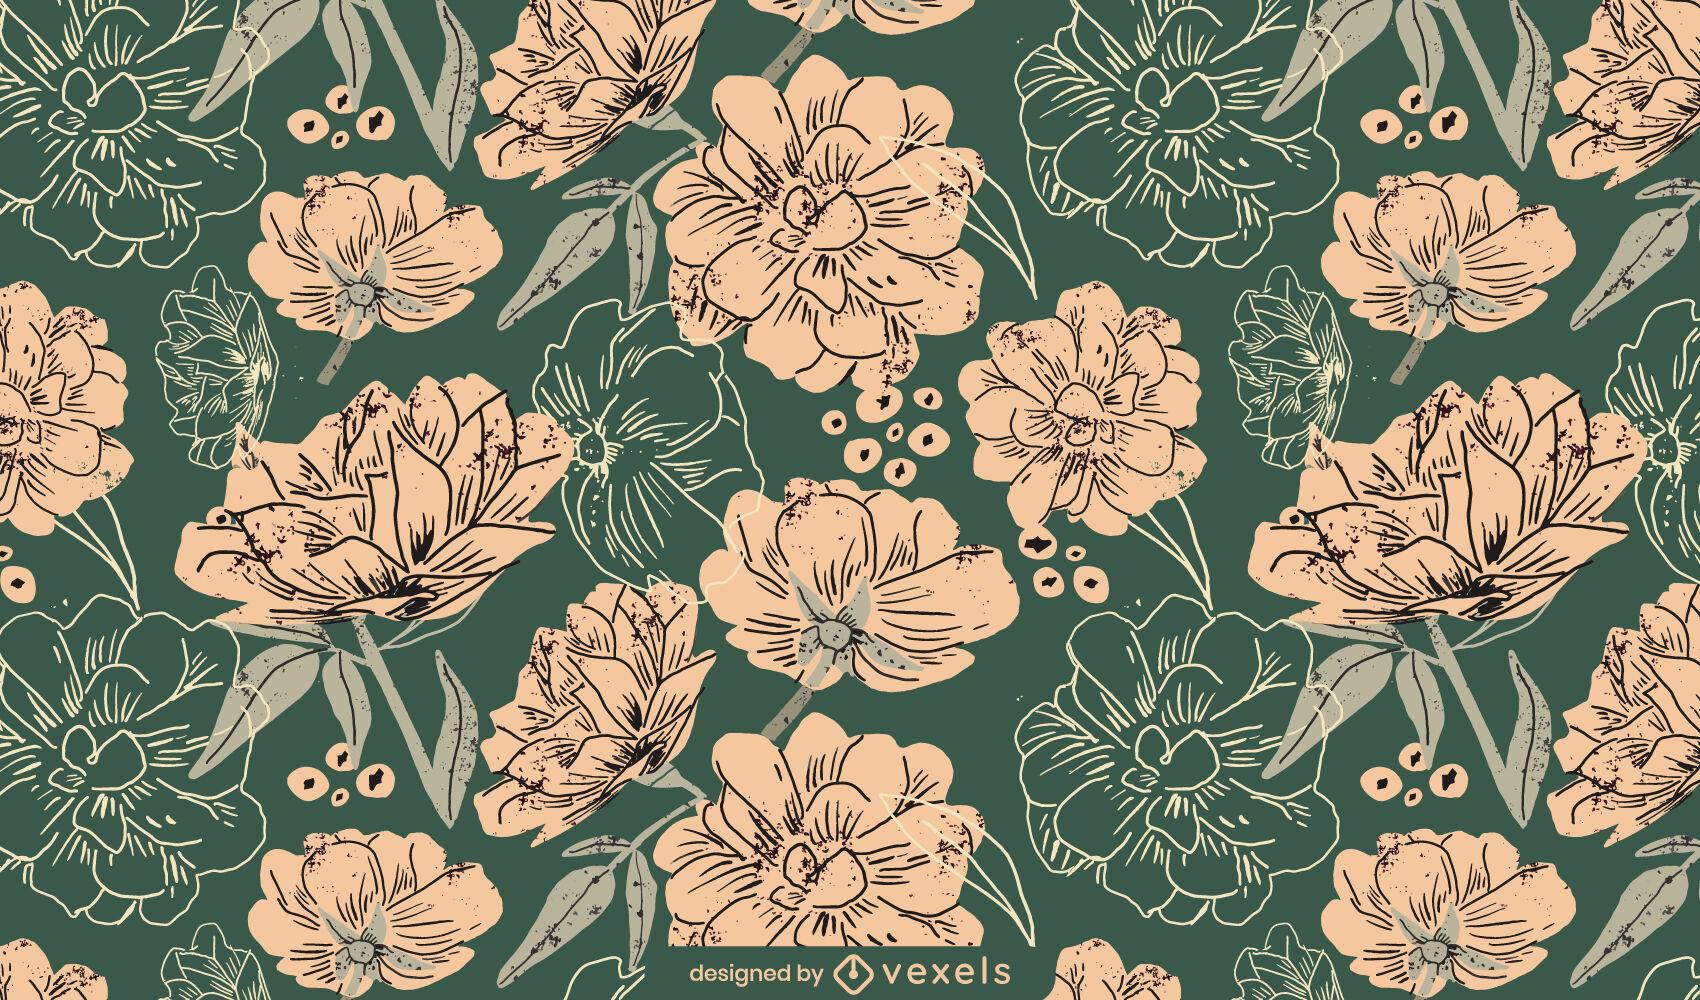 Frühlingsblumen Natur Musterdesign